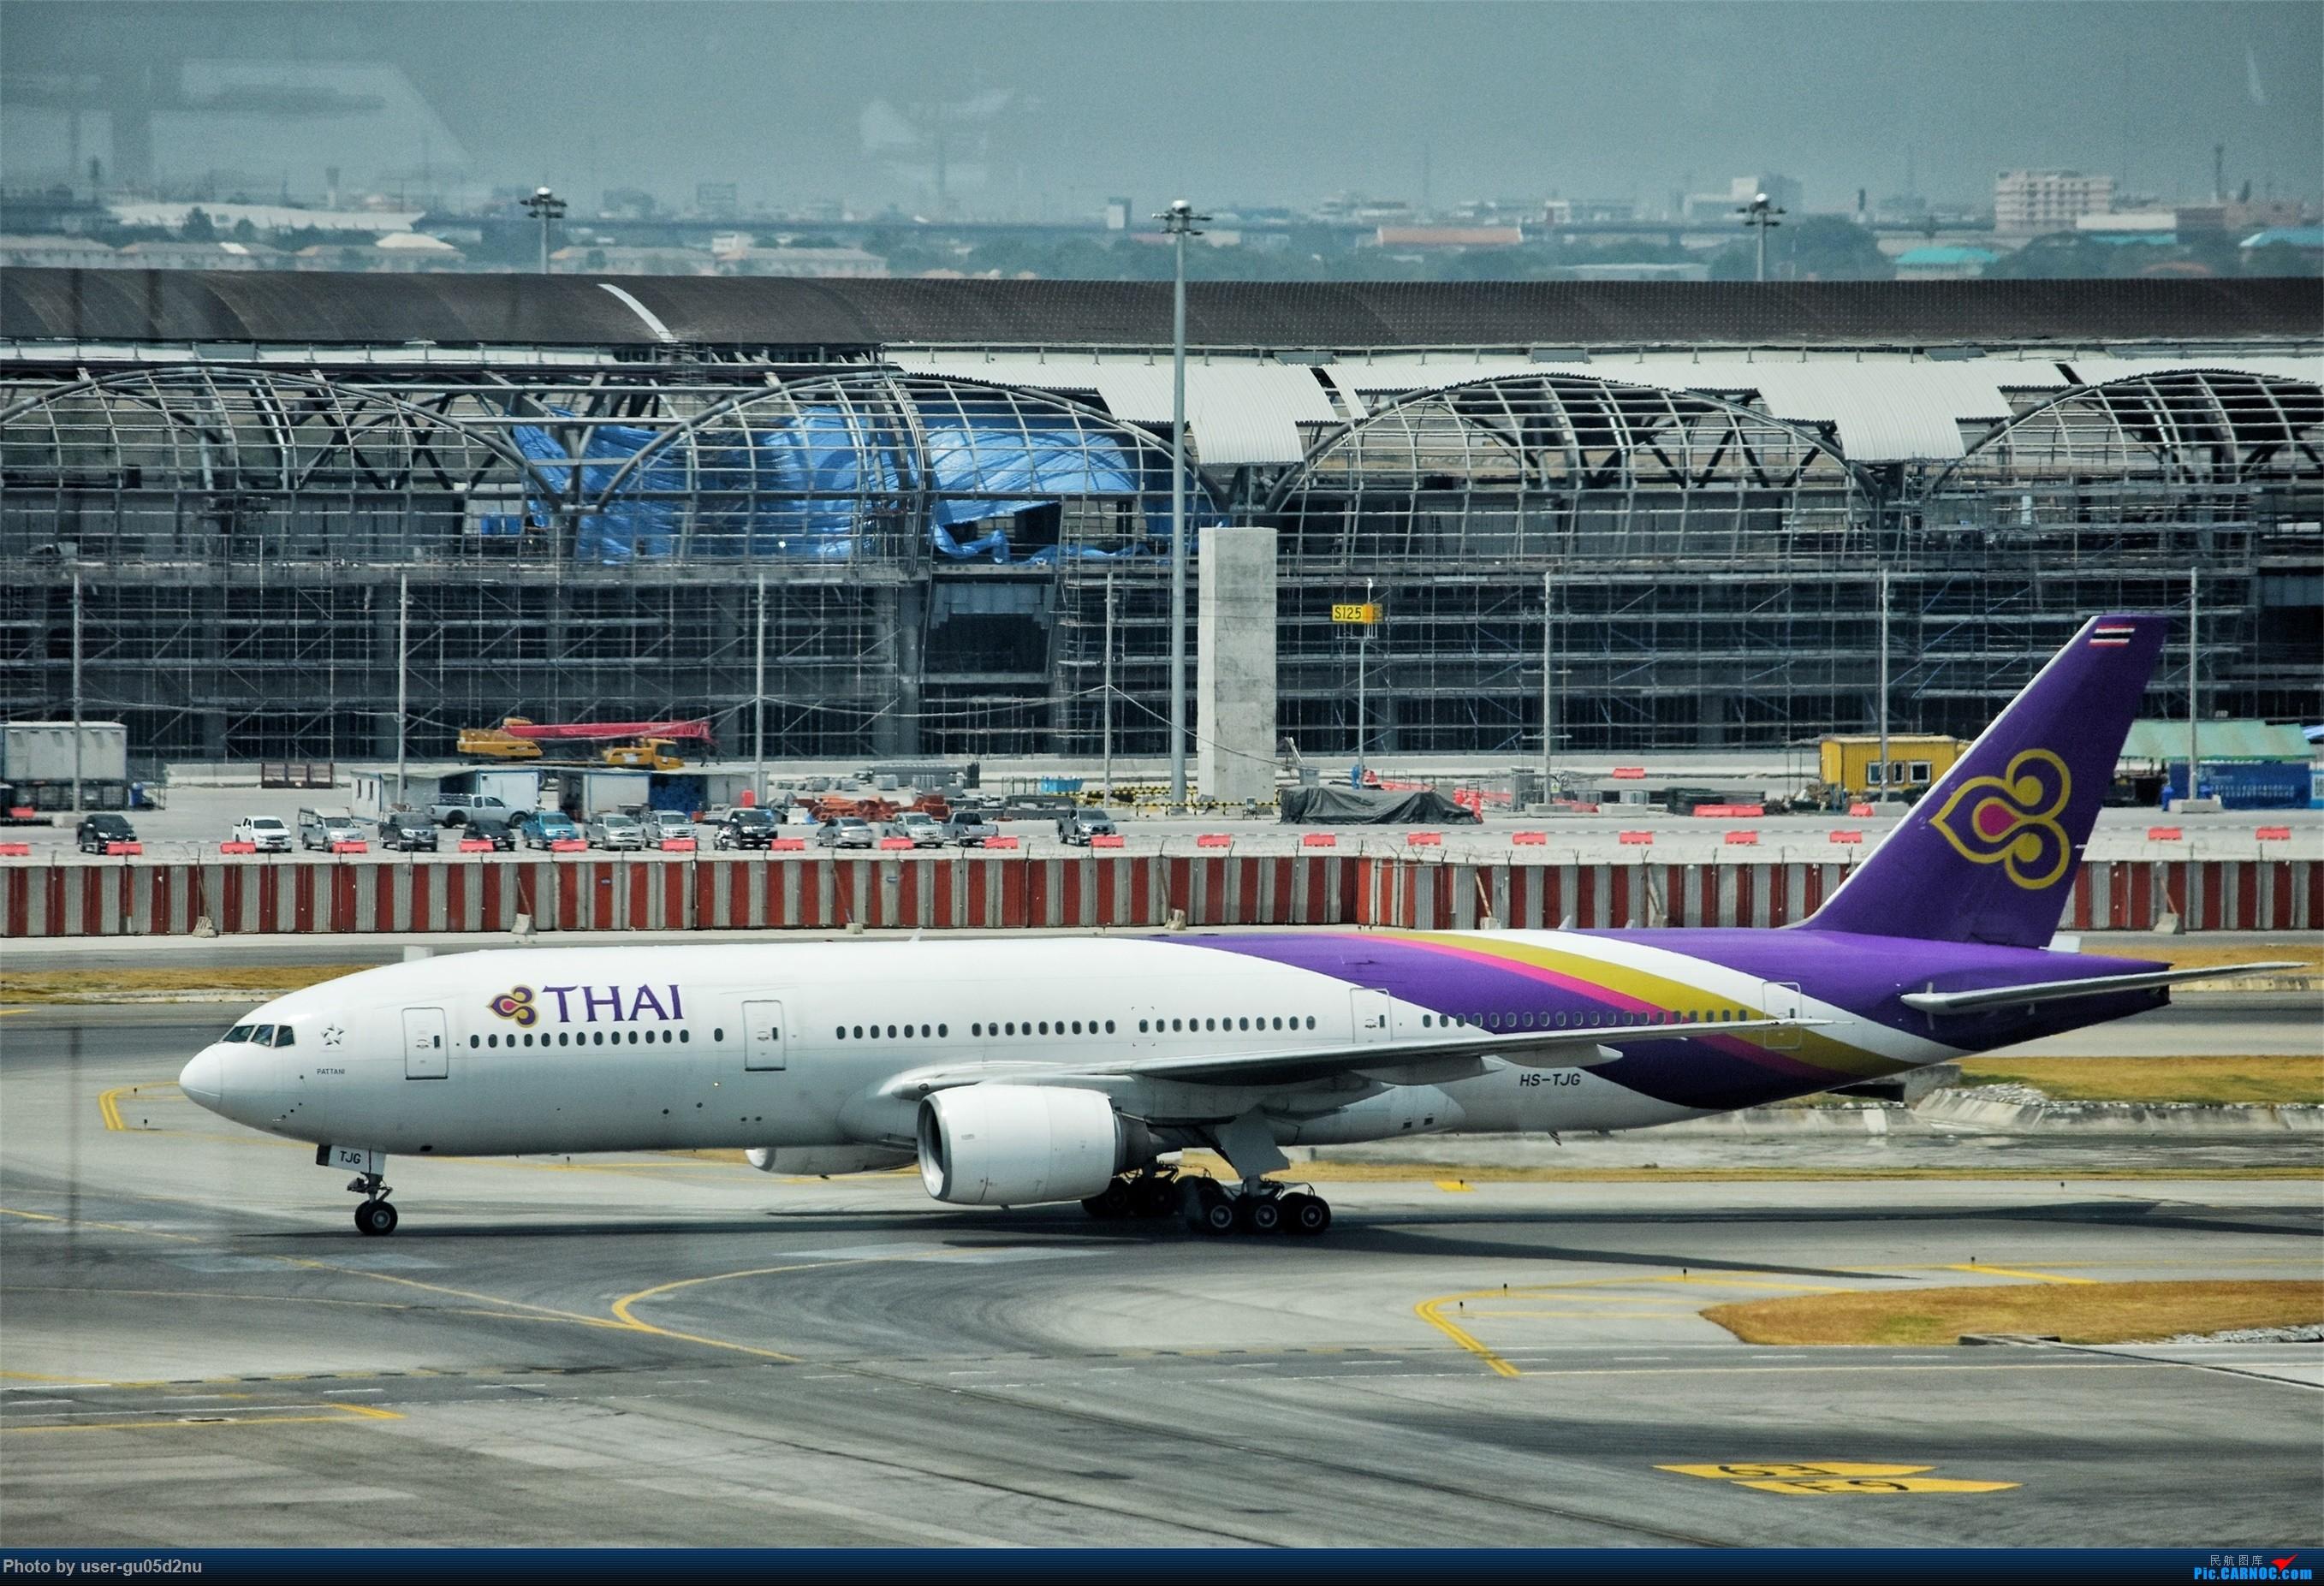 Re:[原创]曼谷素万那普观景平台视角【滑行篇】 BOEING 777 HS-TJG Suvarnabhumi Airport